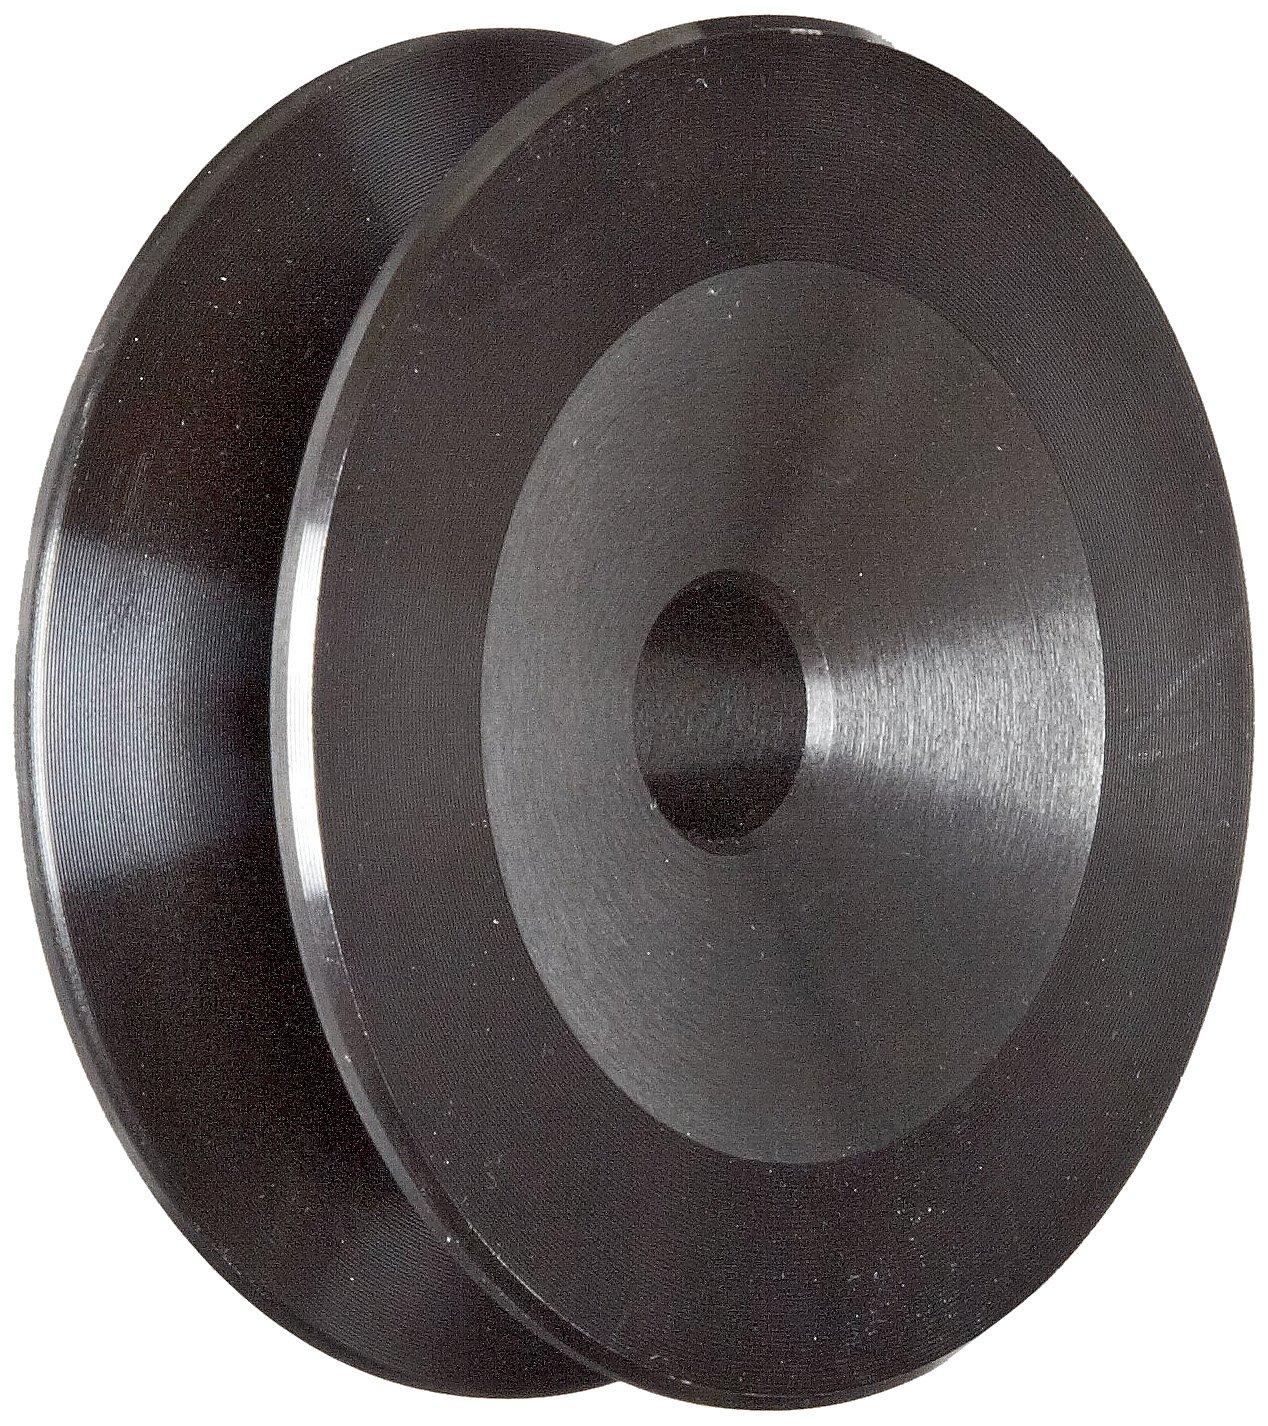 Martin BK27 P/B Plain Bore FHP Sheave, 4L/5L or B Belt Section, 1 Groove, 1/2'' Bore, Class 30 Gray Cast Iron, 2.7'' OD, 9189 max rpm, 2.1 Datum/2.5 Datum